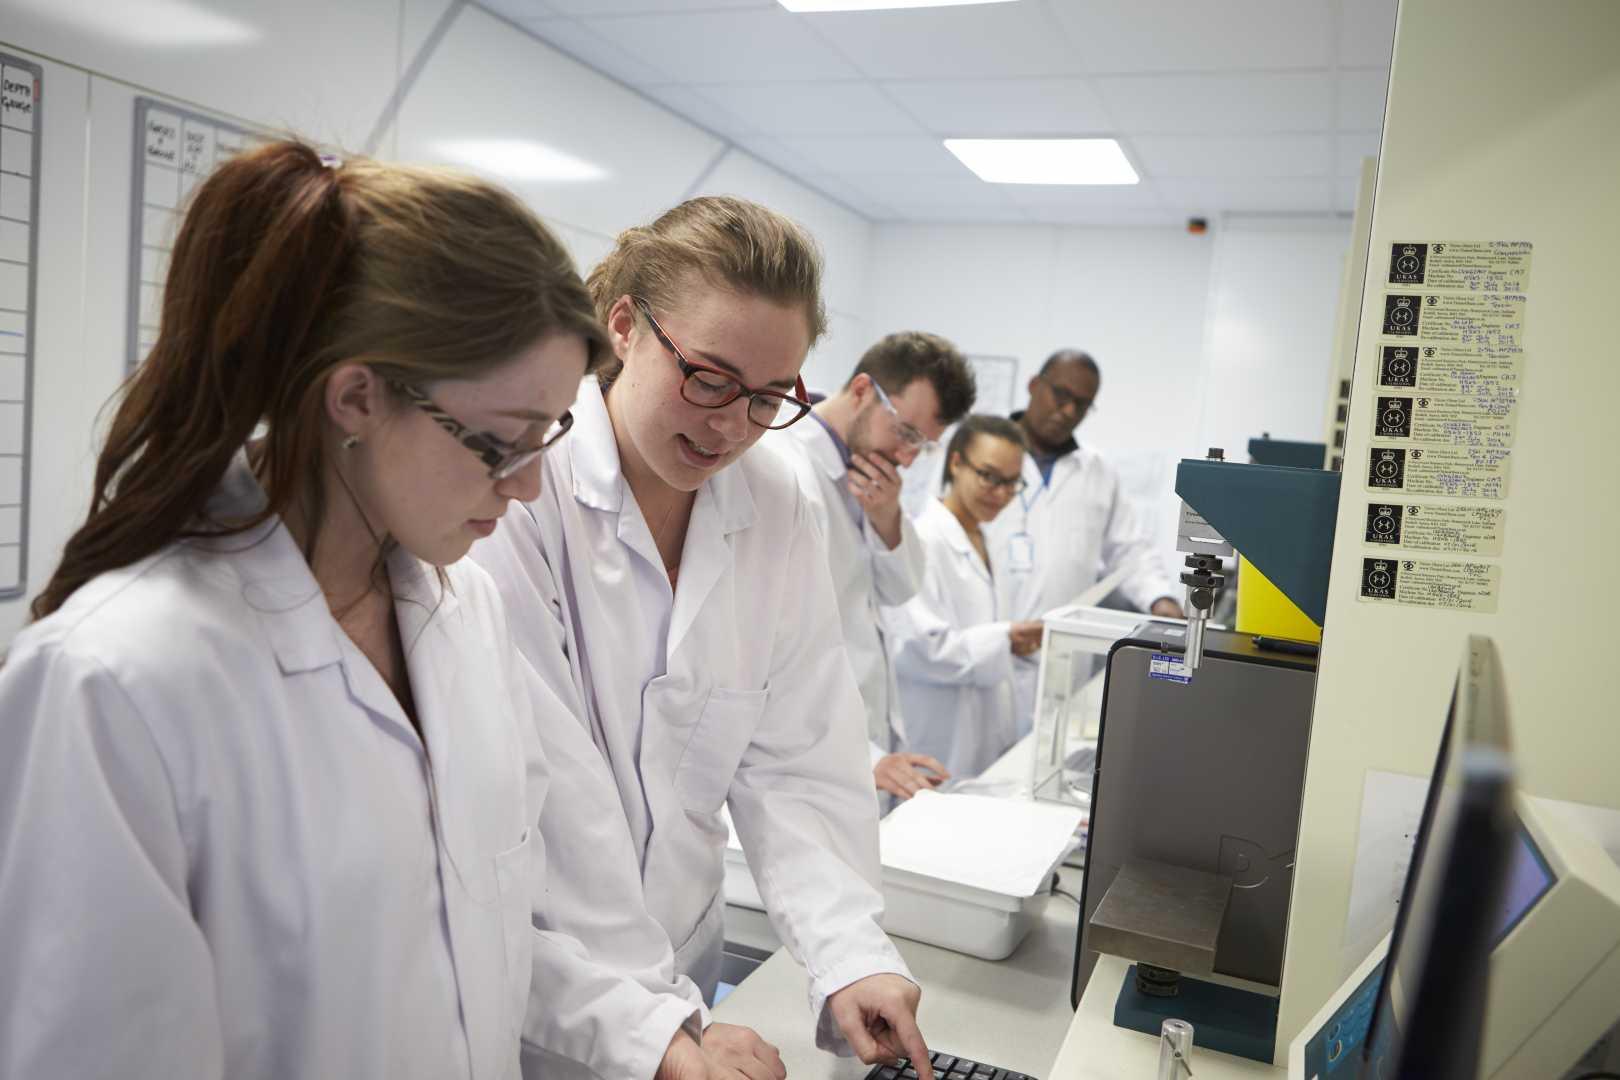 Owen Mumford: Behind the scenes: R&D in medical device design 6